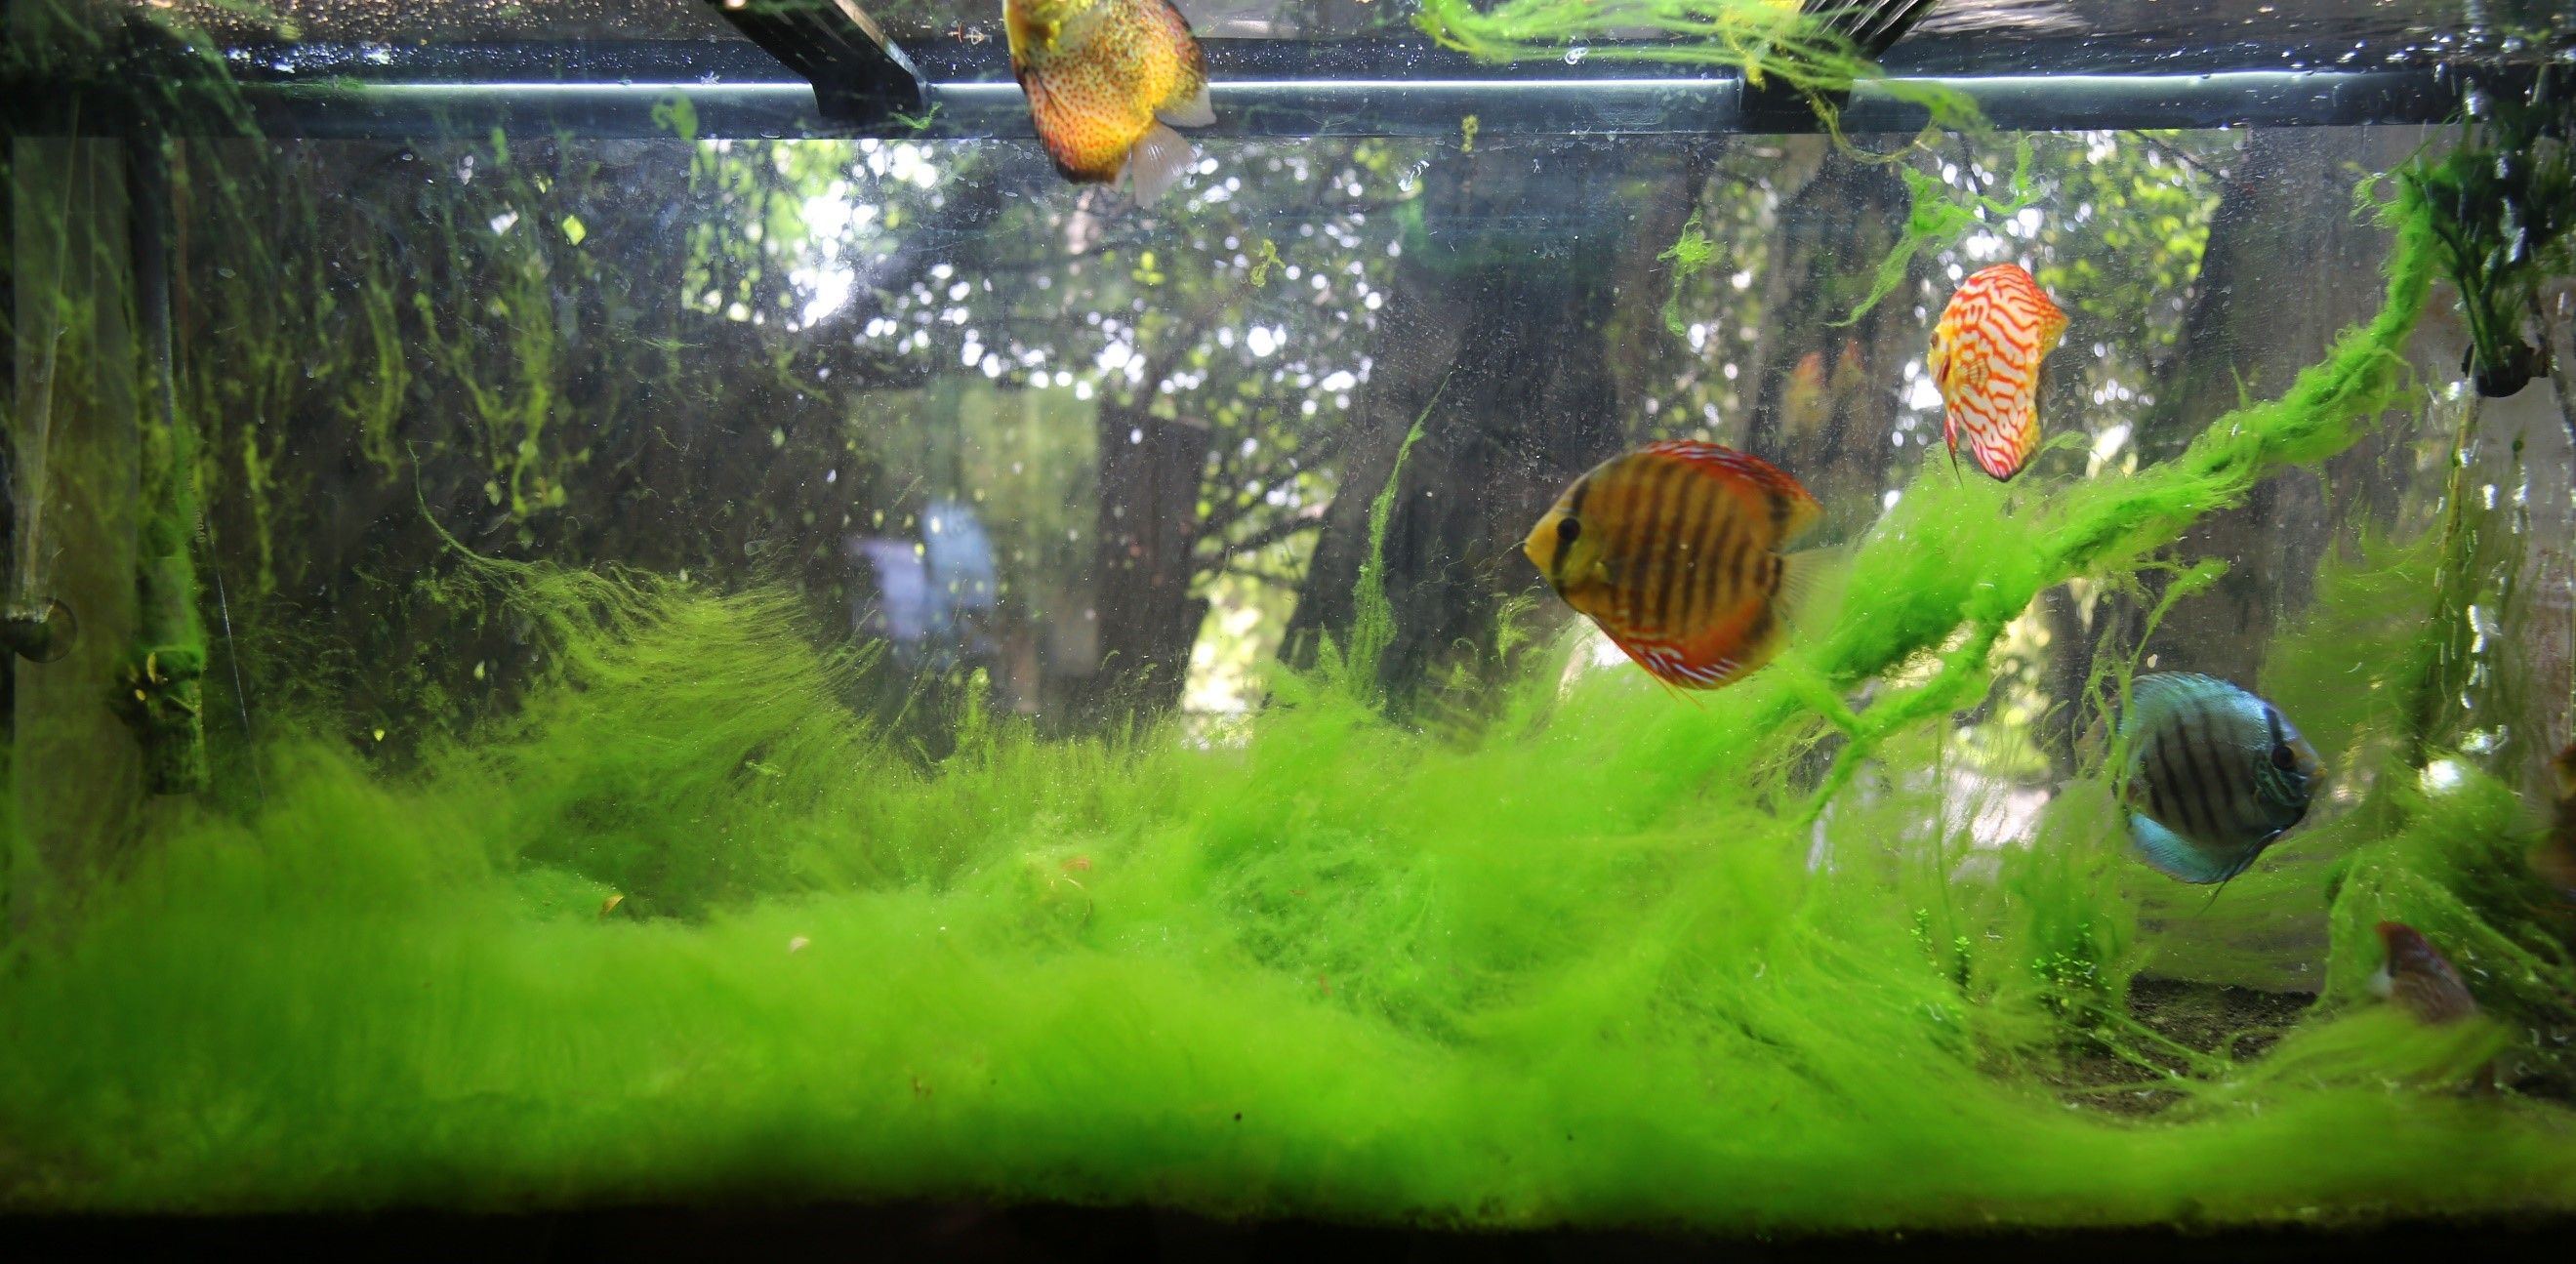 Hair Algae Epidemic Tropical Fish Forums,How To Grow Sweet Potatoes Indoors